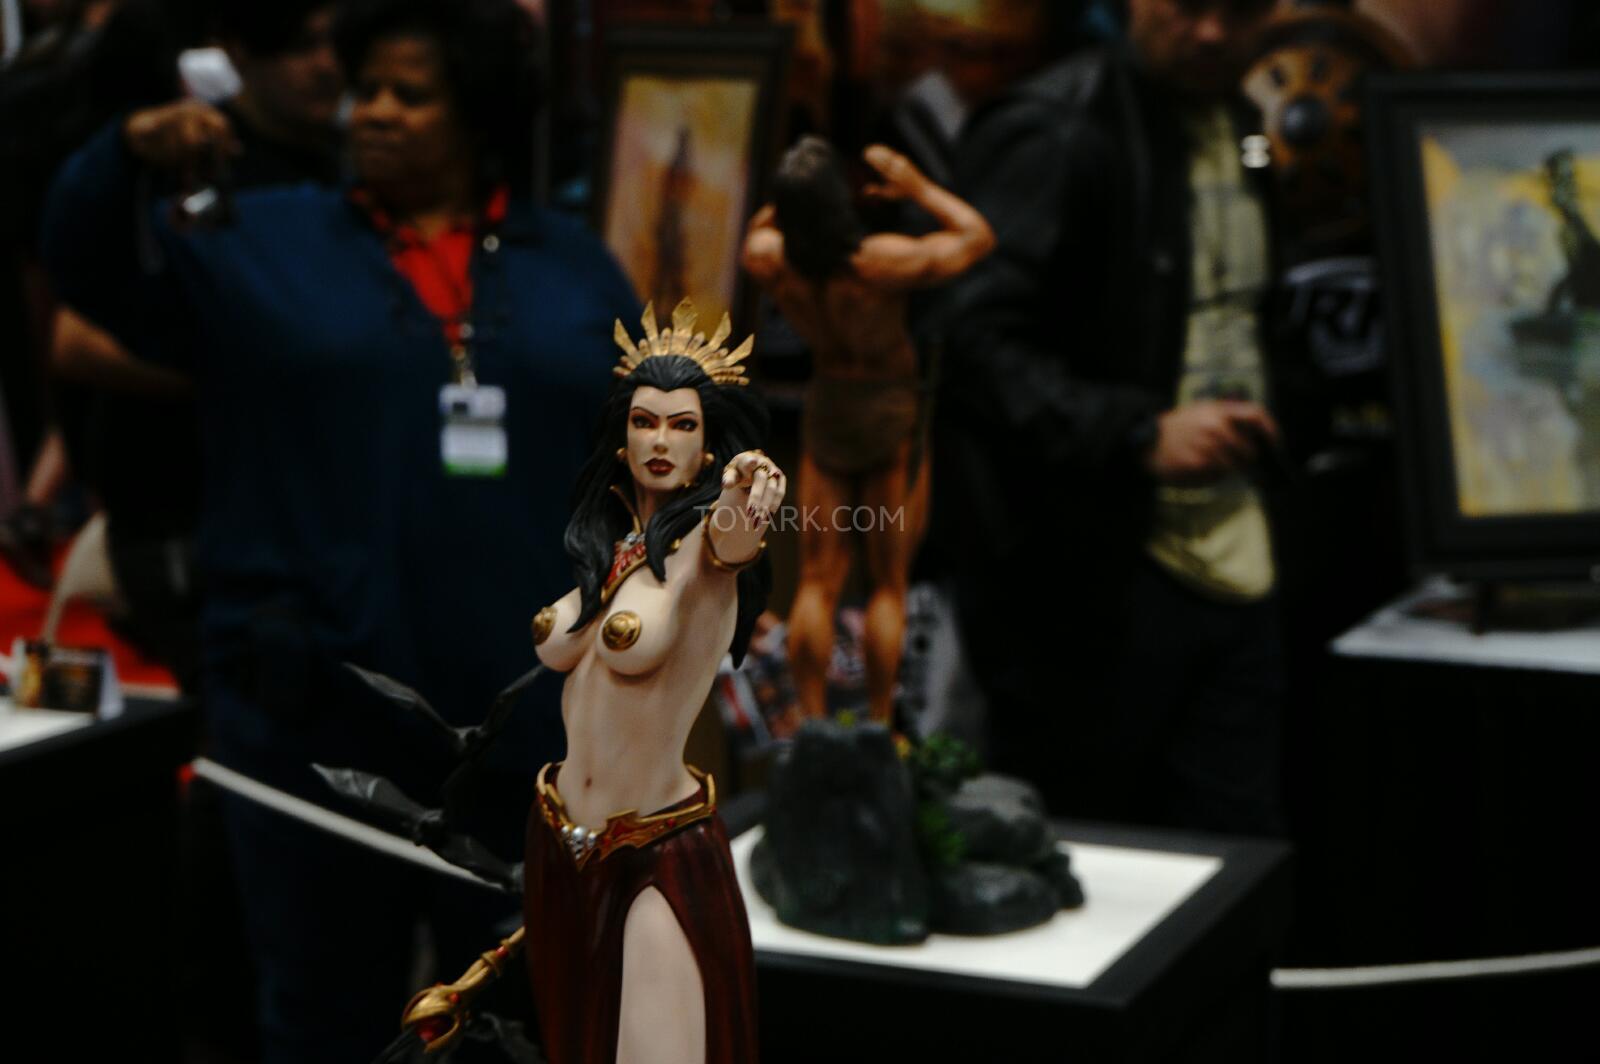 [ARH Studios] New Queen of Vampires 1/4 Scale Statue - Página 2 NYCC-2014-ARH-Studios-014